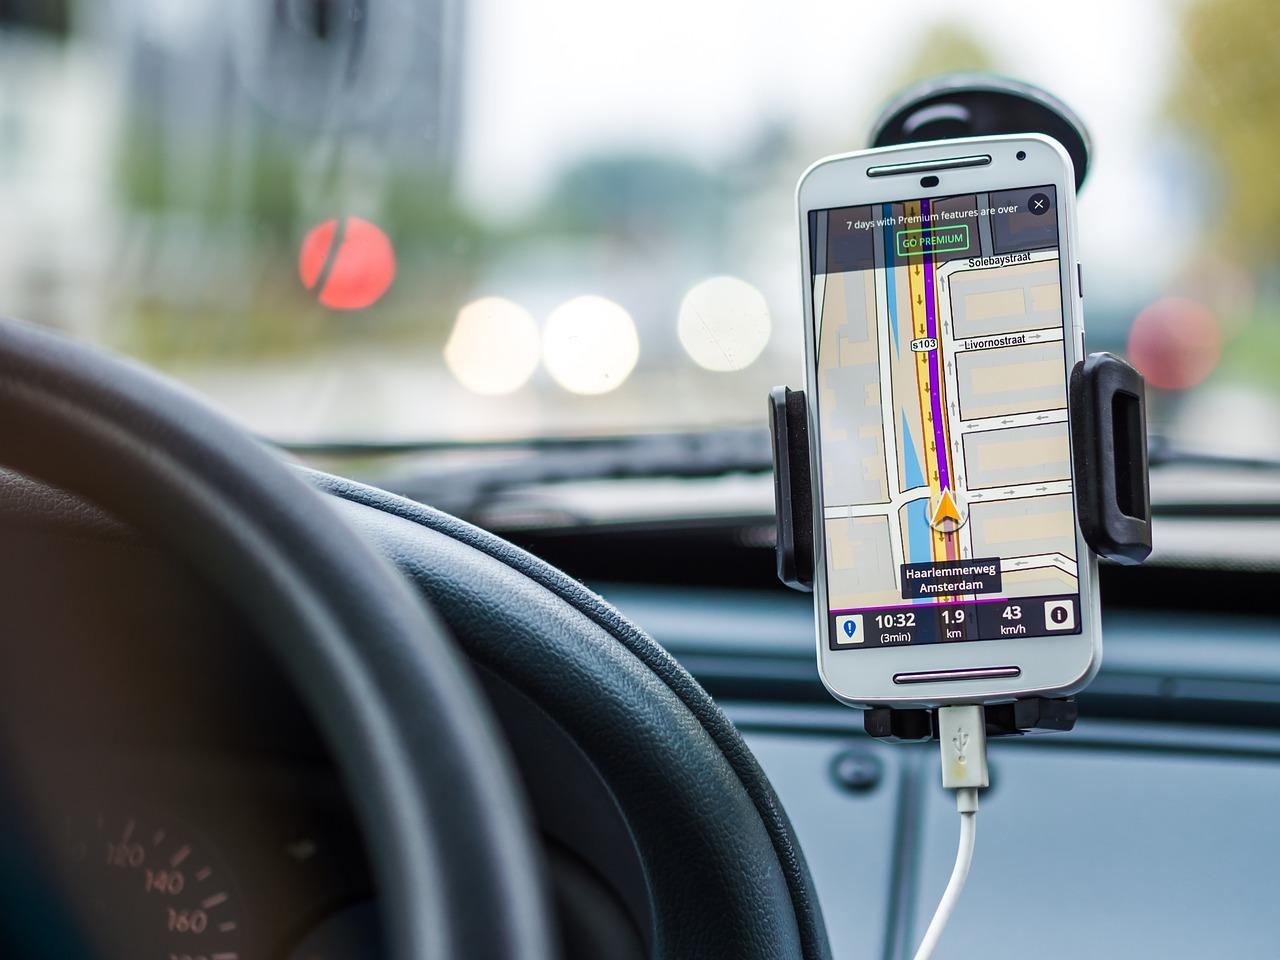 приложение, навигатор, смартфон